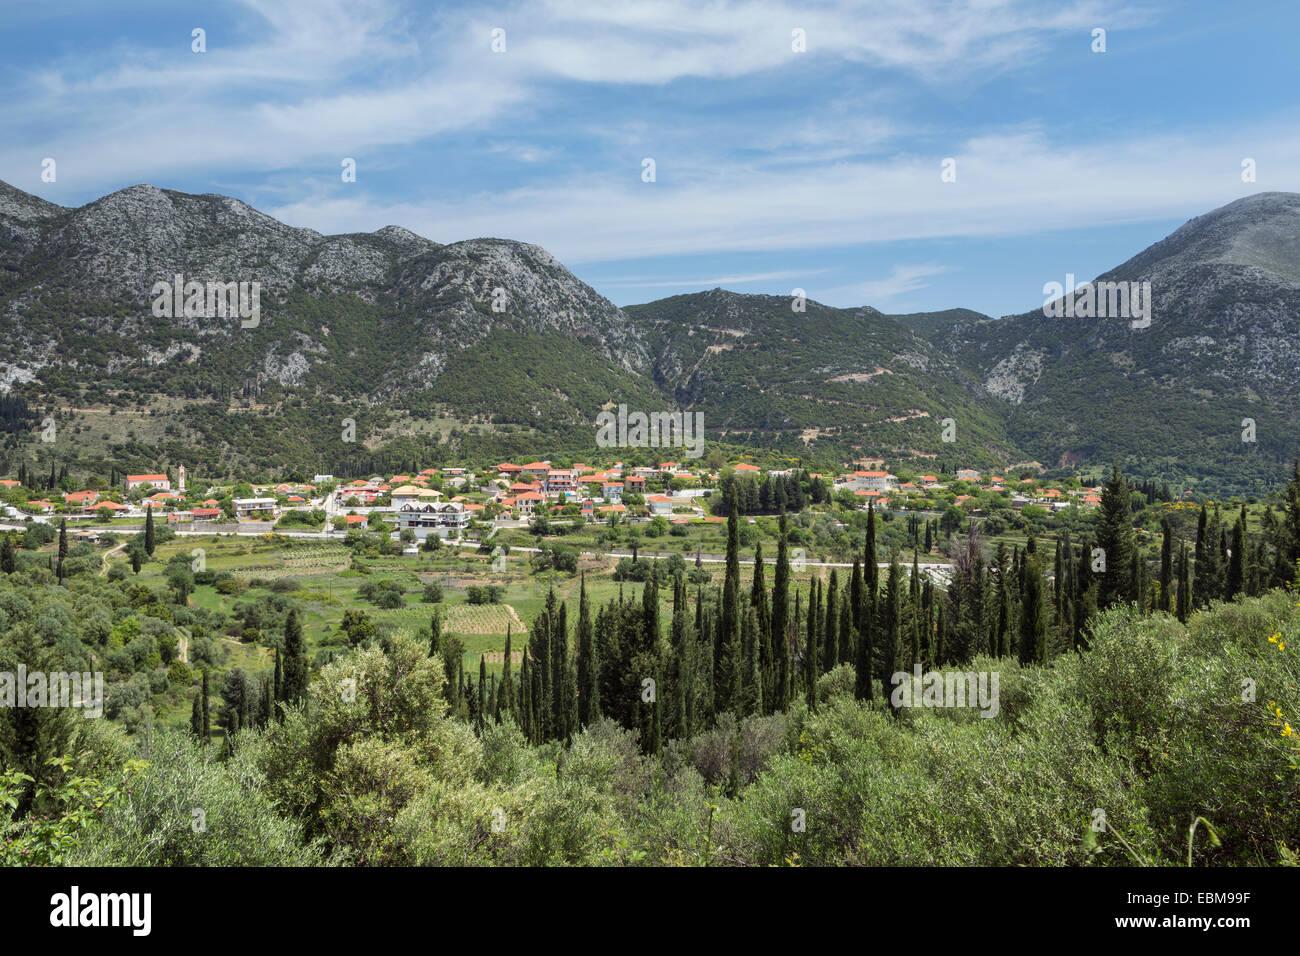 The beautiful greek village of Agios Nikolaos sits in the mountains, Kefalonia. Stock Photo